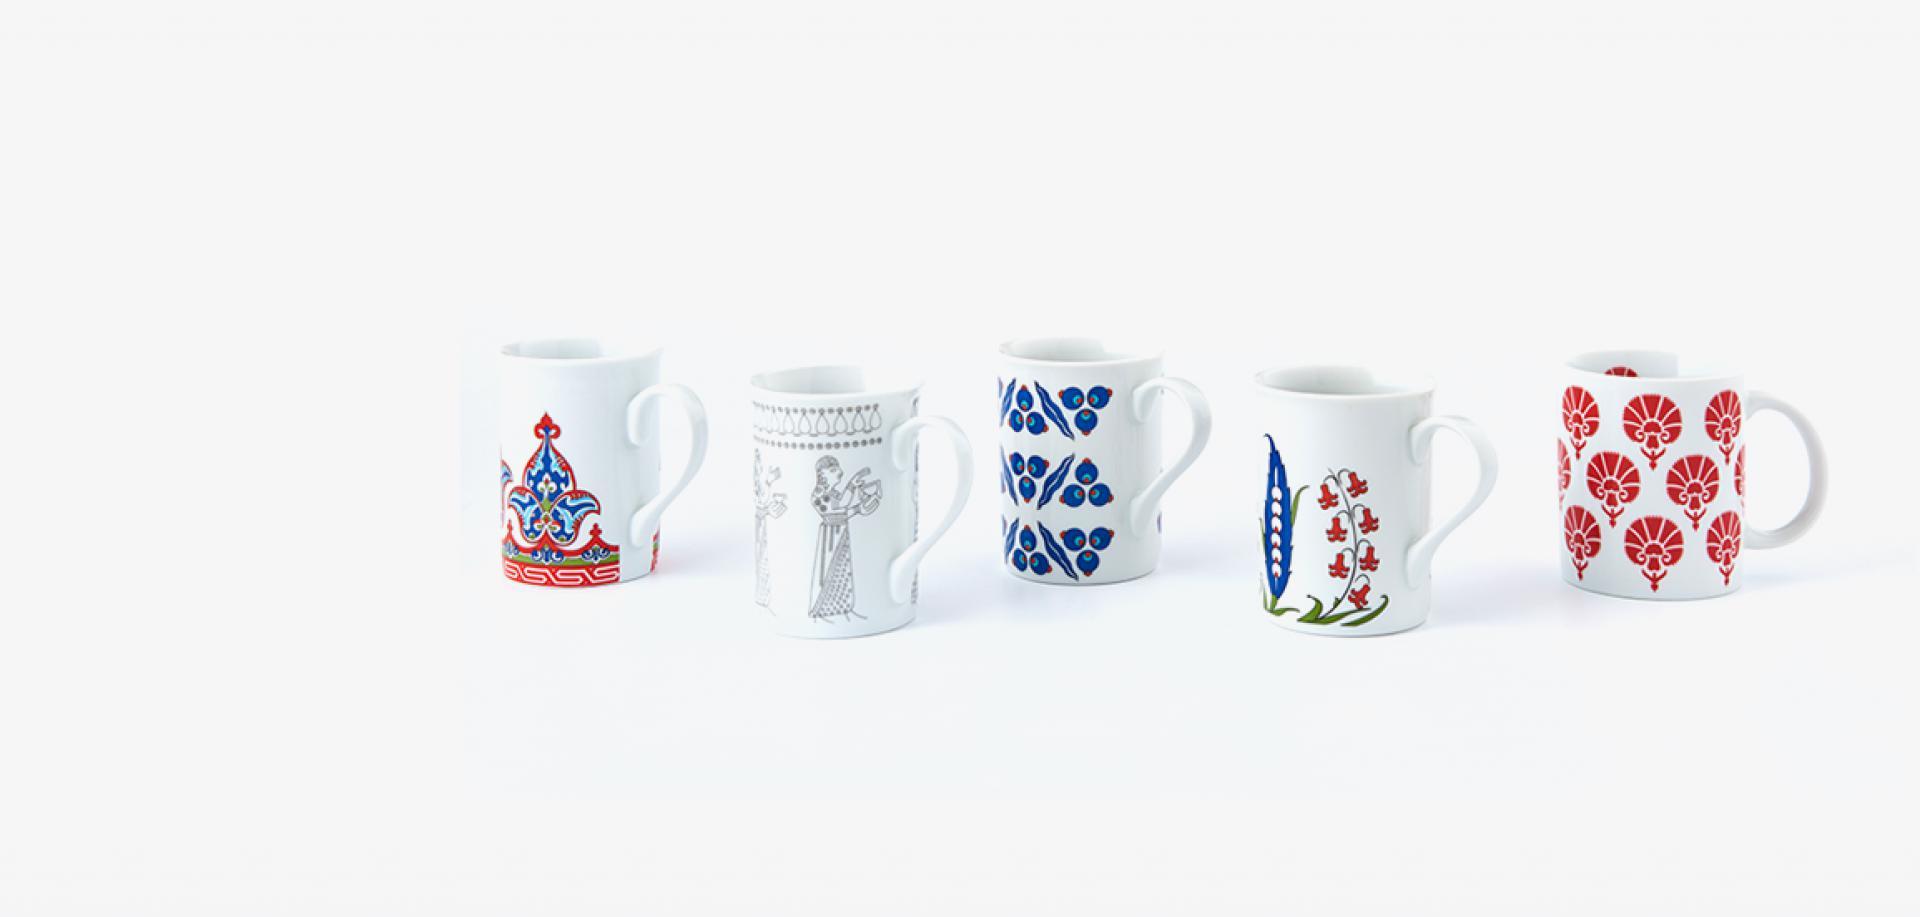 Mug - SHOP - Sadberk Hanım Museum